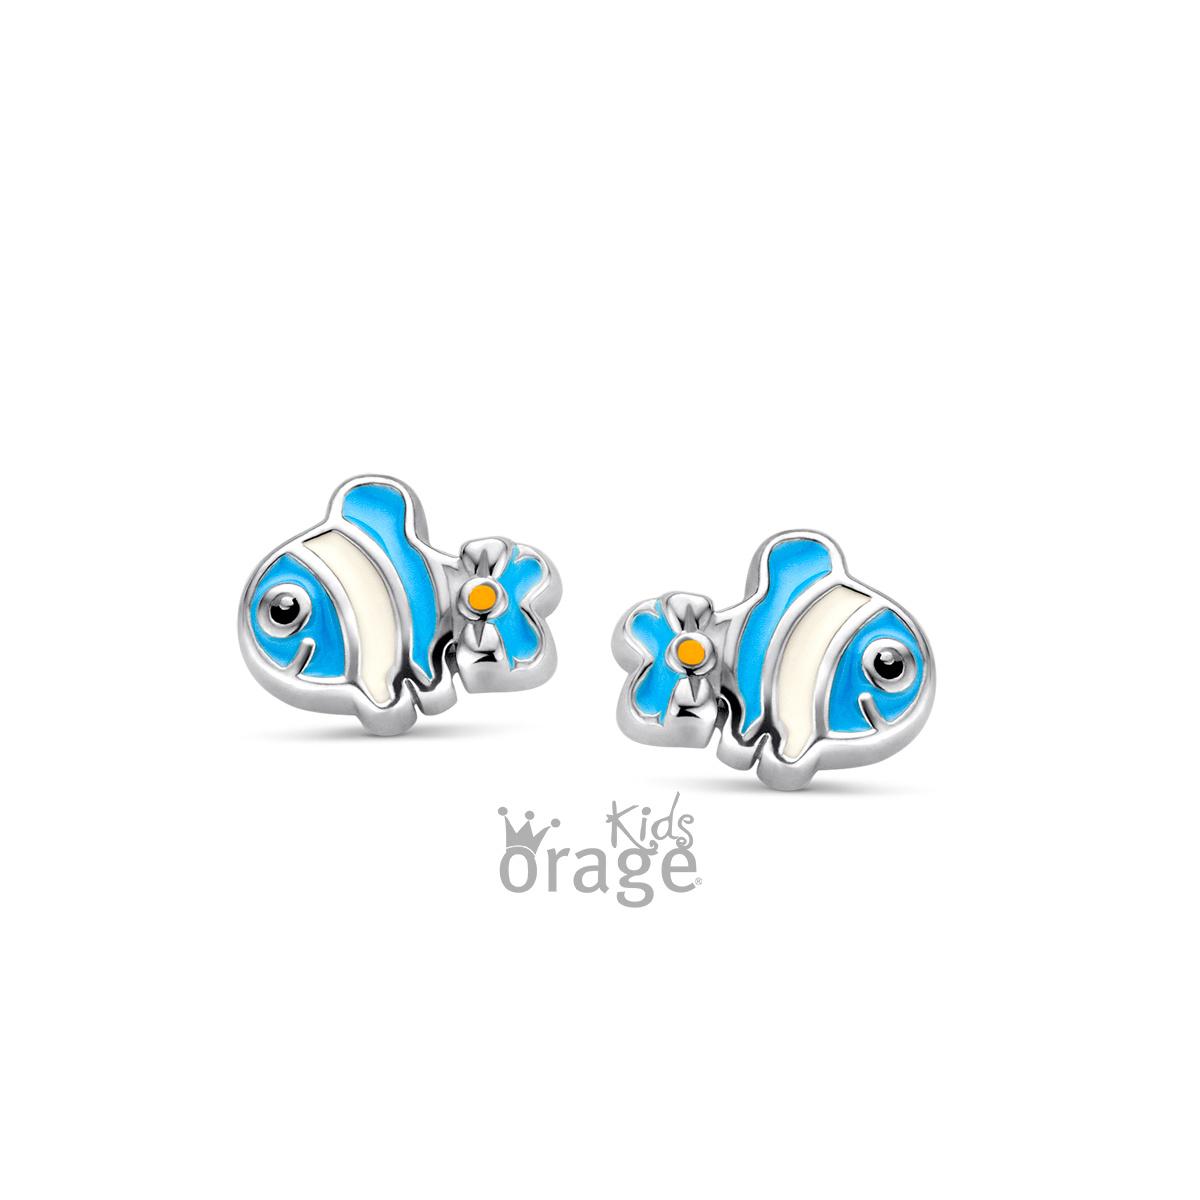 Orage kids Oorringen vis blauw